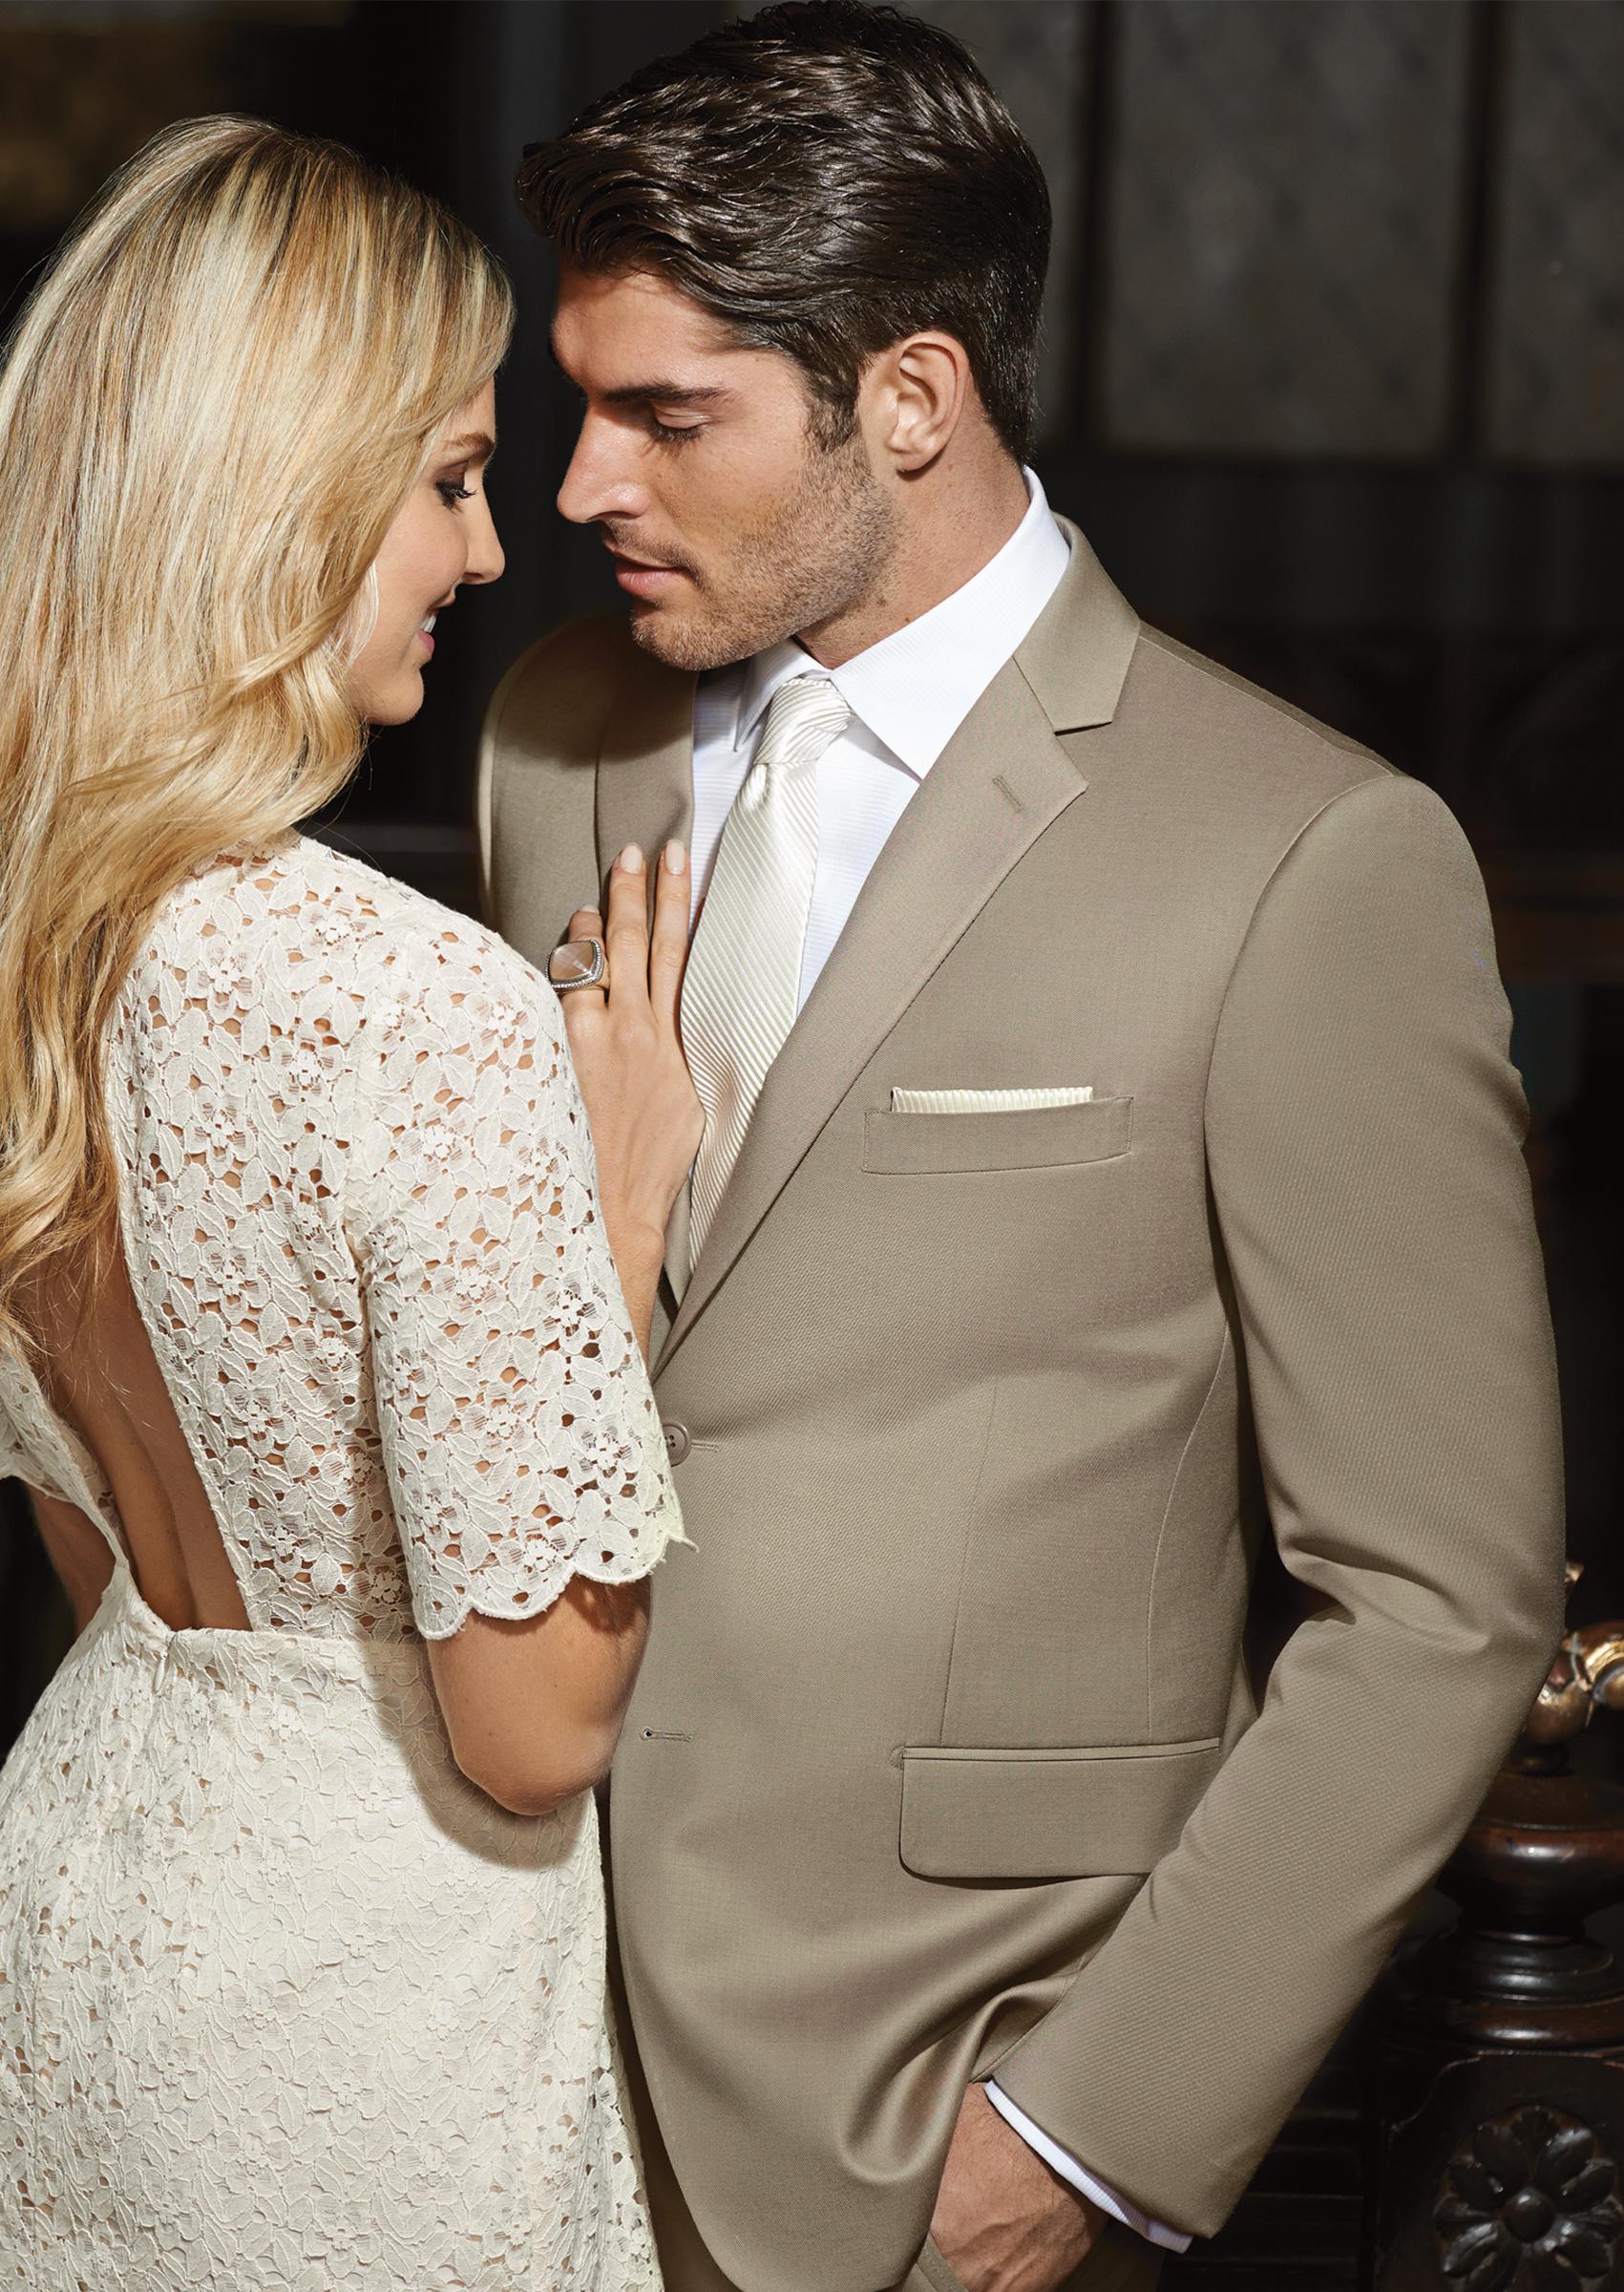 Tuxedo Central | Someday | Pinterest | Rent tuxedo and Wedding